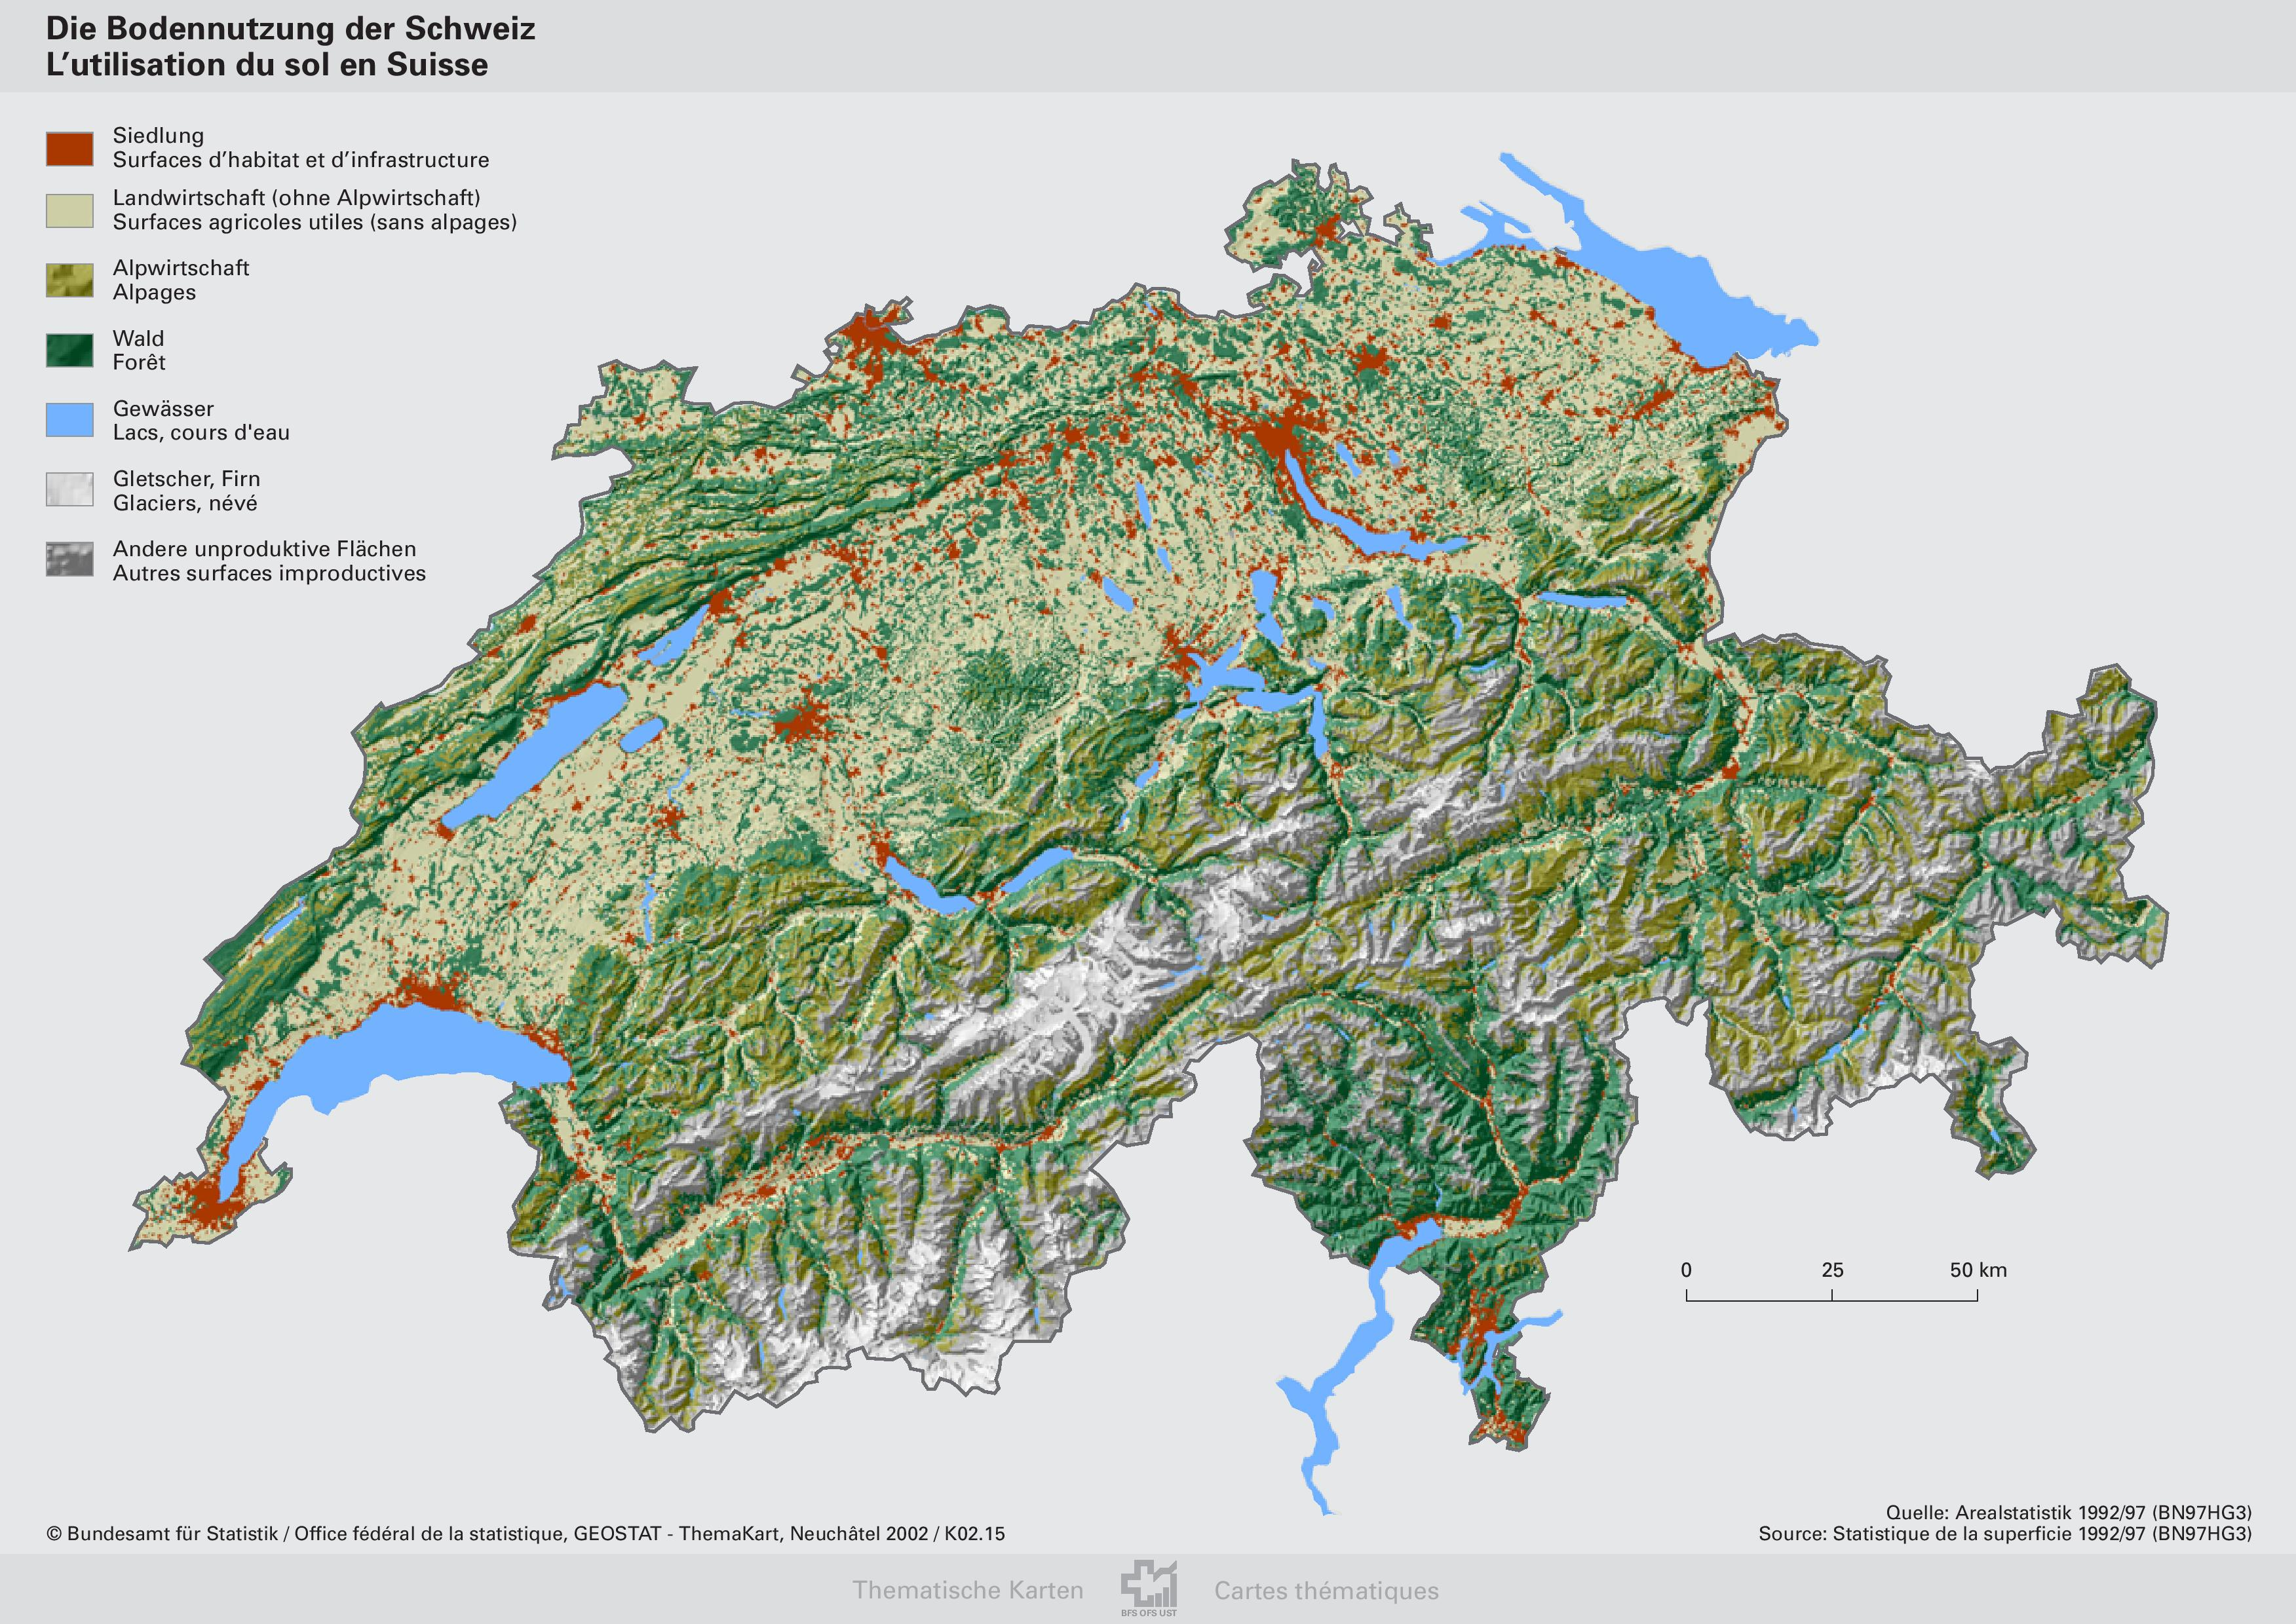 Switzerland In World Map.10 Maps That Explain Switzerland Geovisualist